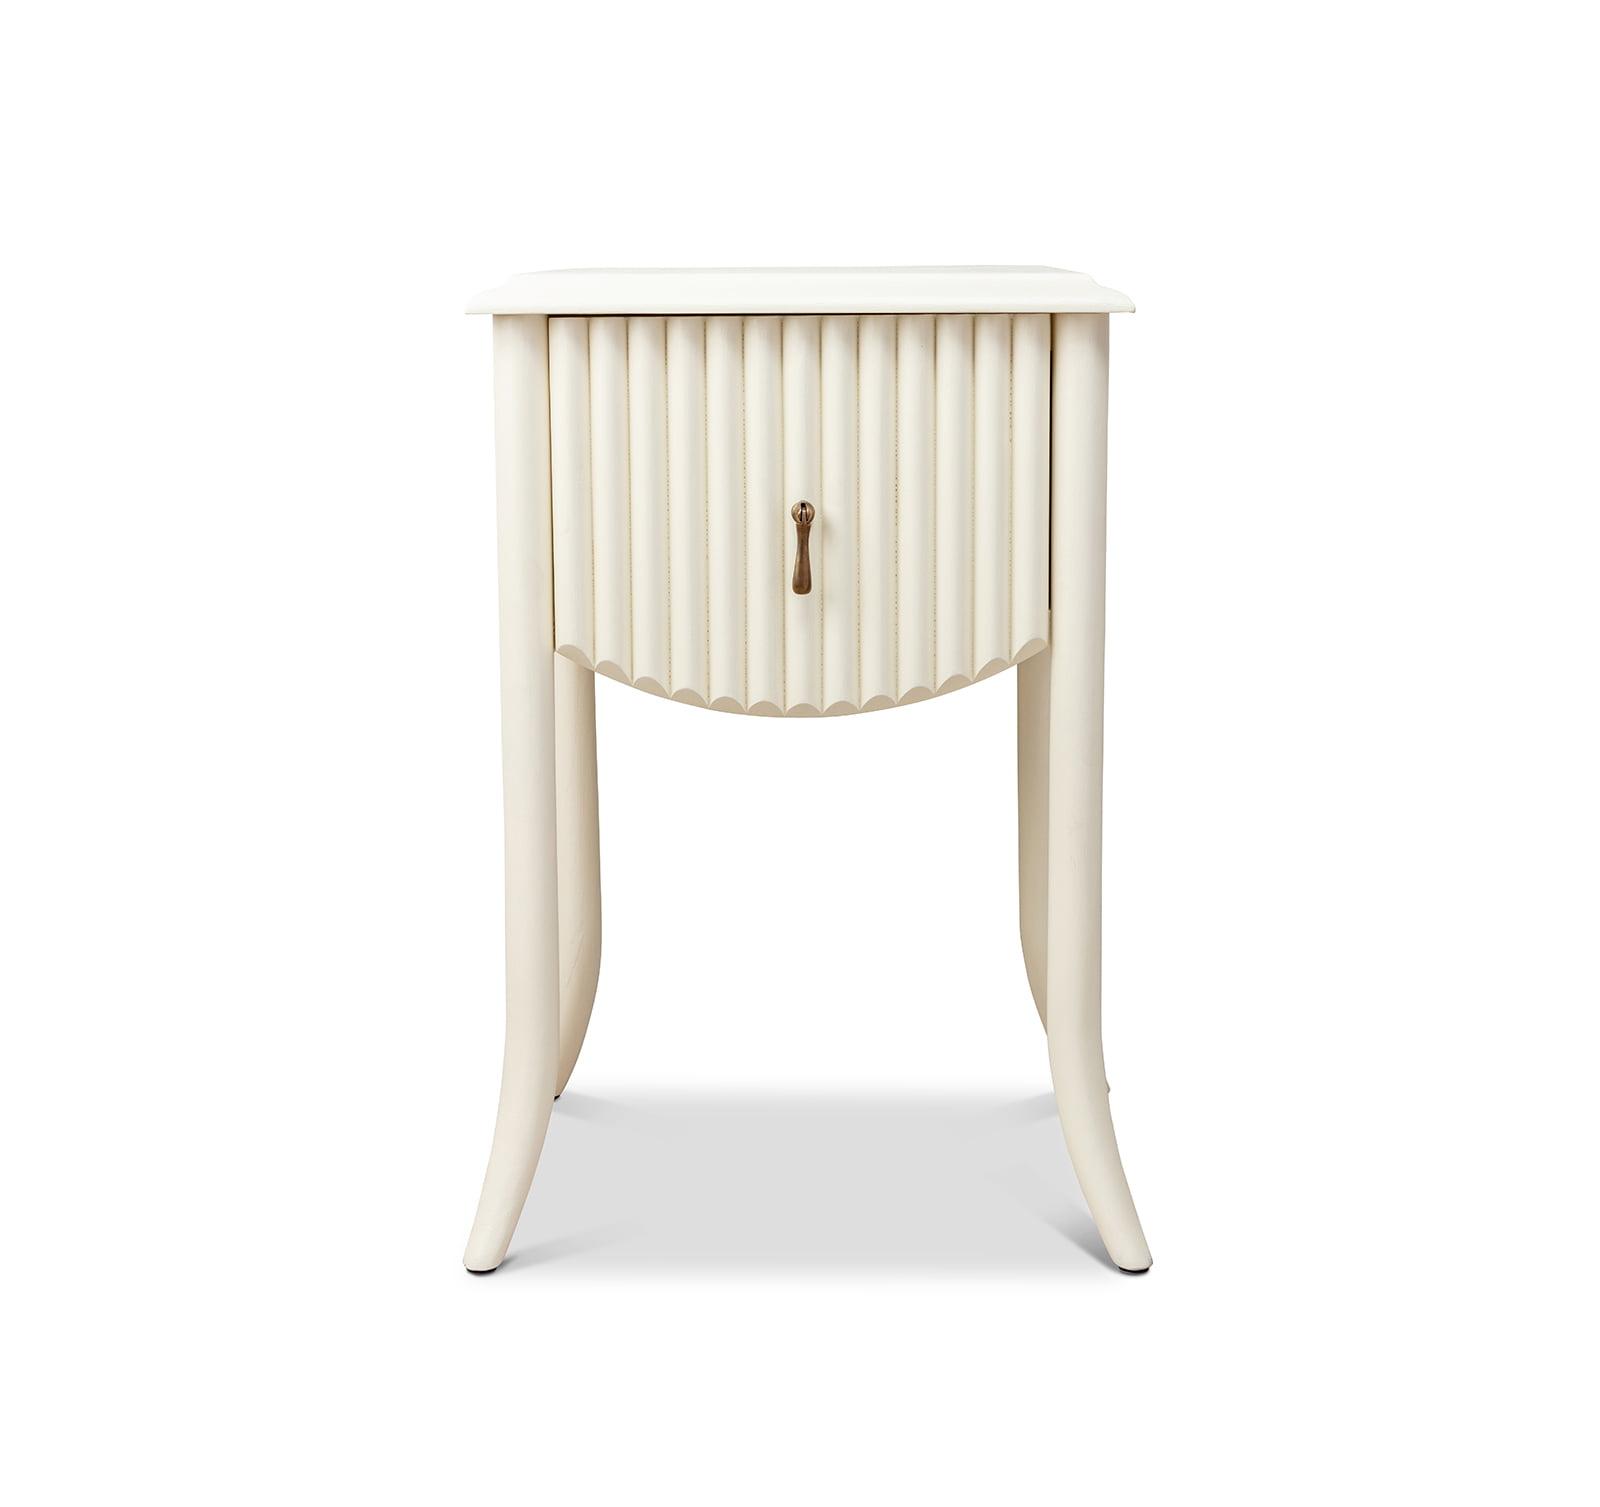 Avalon Petite Bedside Table